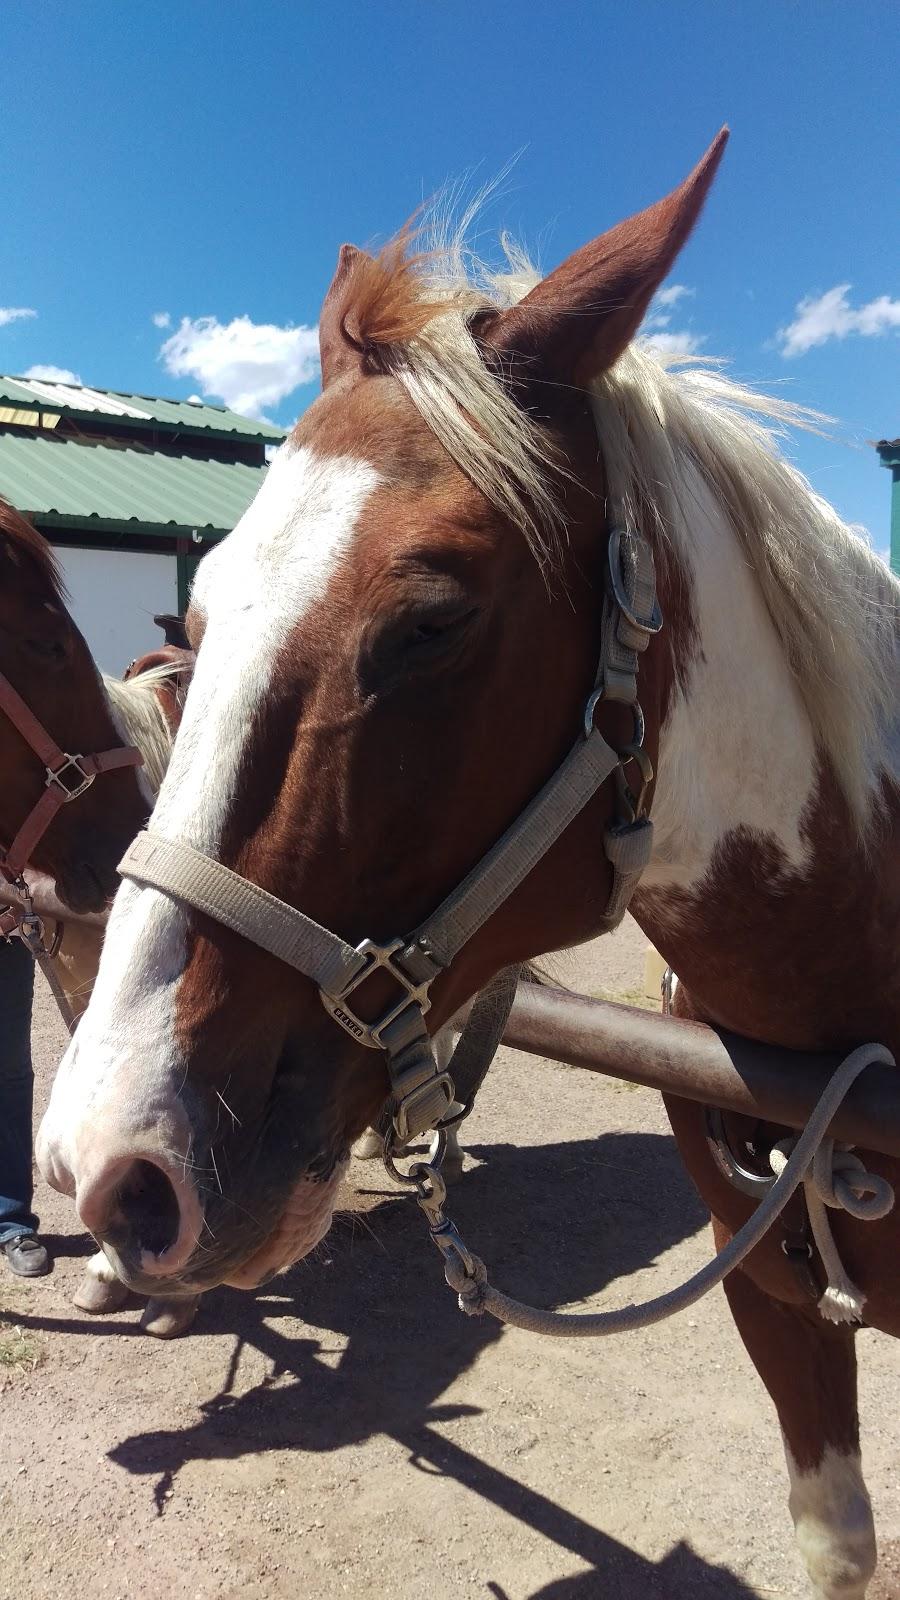 Ariz Horseback Experience - store    Photo 1 of 10   Address: 16 Coyote Ct, Sonoita, AZ 85637, USA   Phone: (520) 455-5696